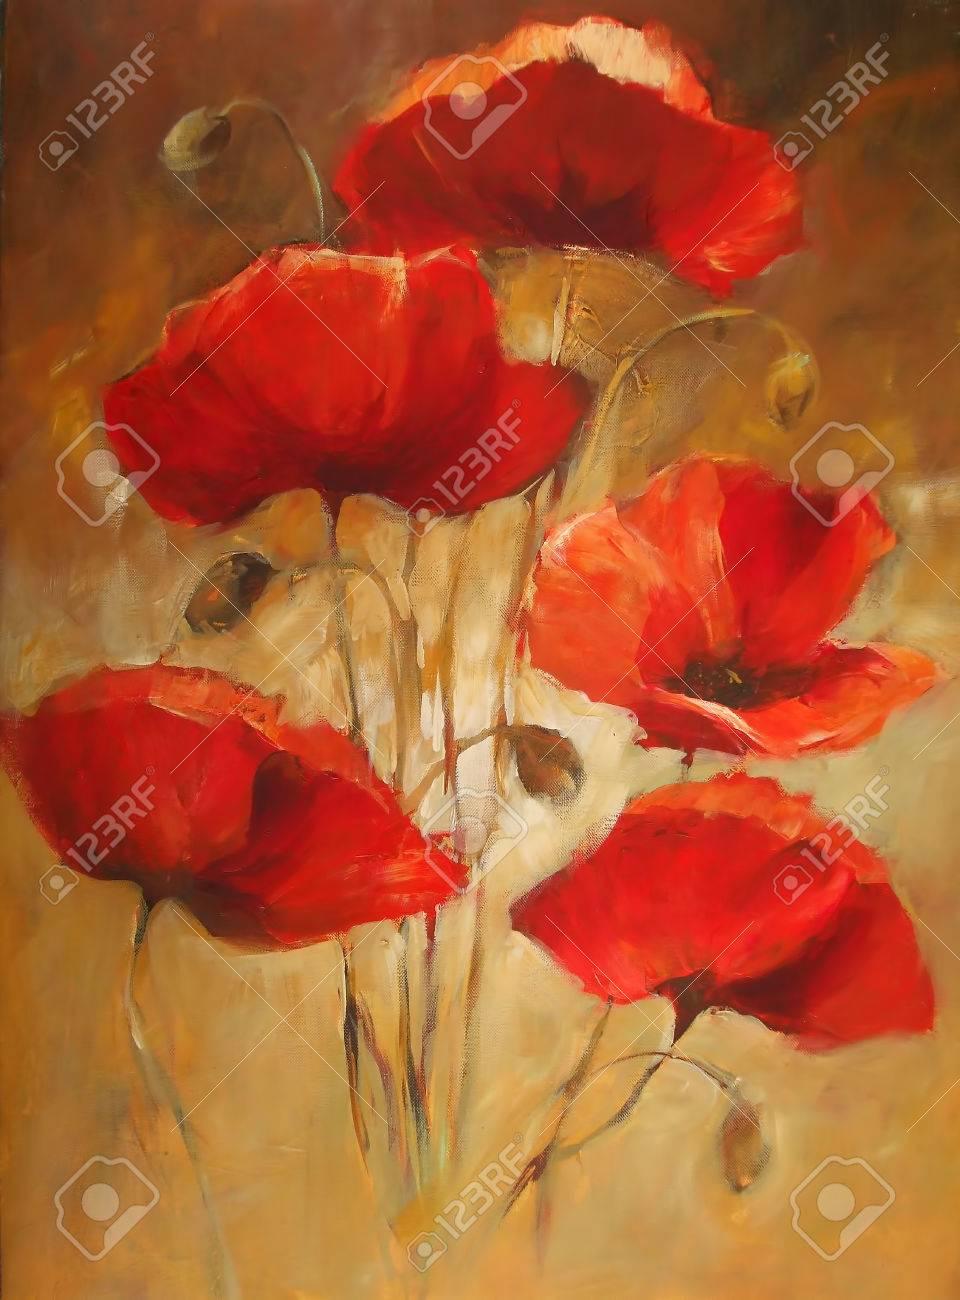 Poppy flowers handmade oil painting on canvas stock photo picture poppy flowers handmade oil painting on canvas stock photo 55509852 mightylinksfo